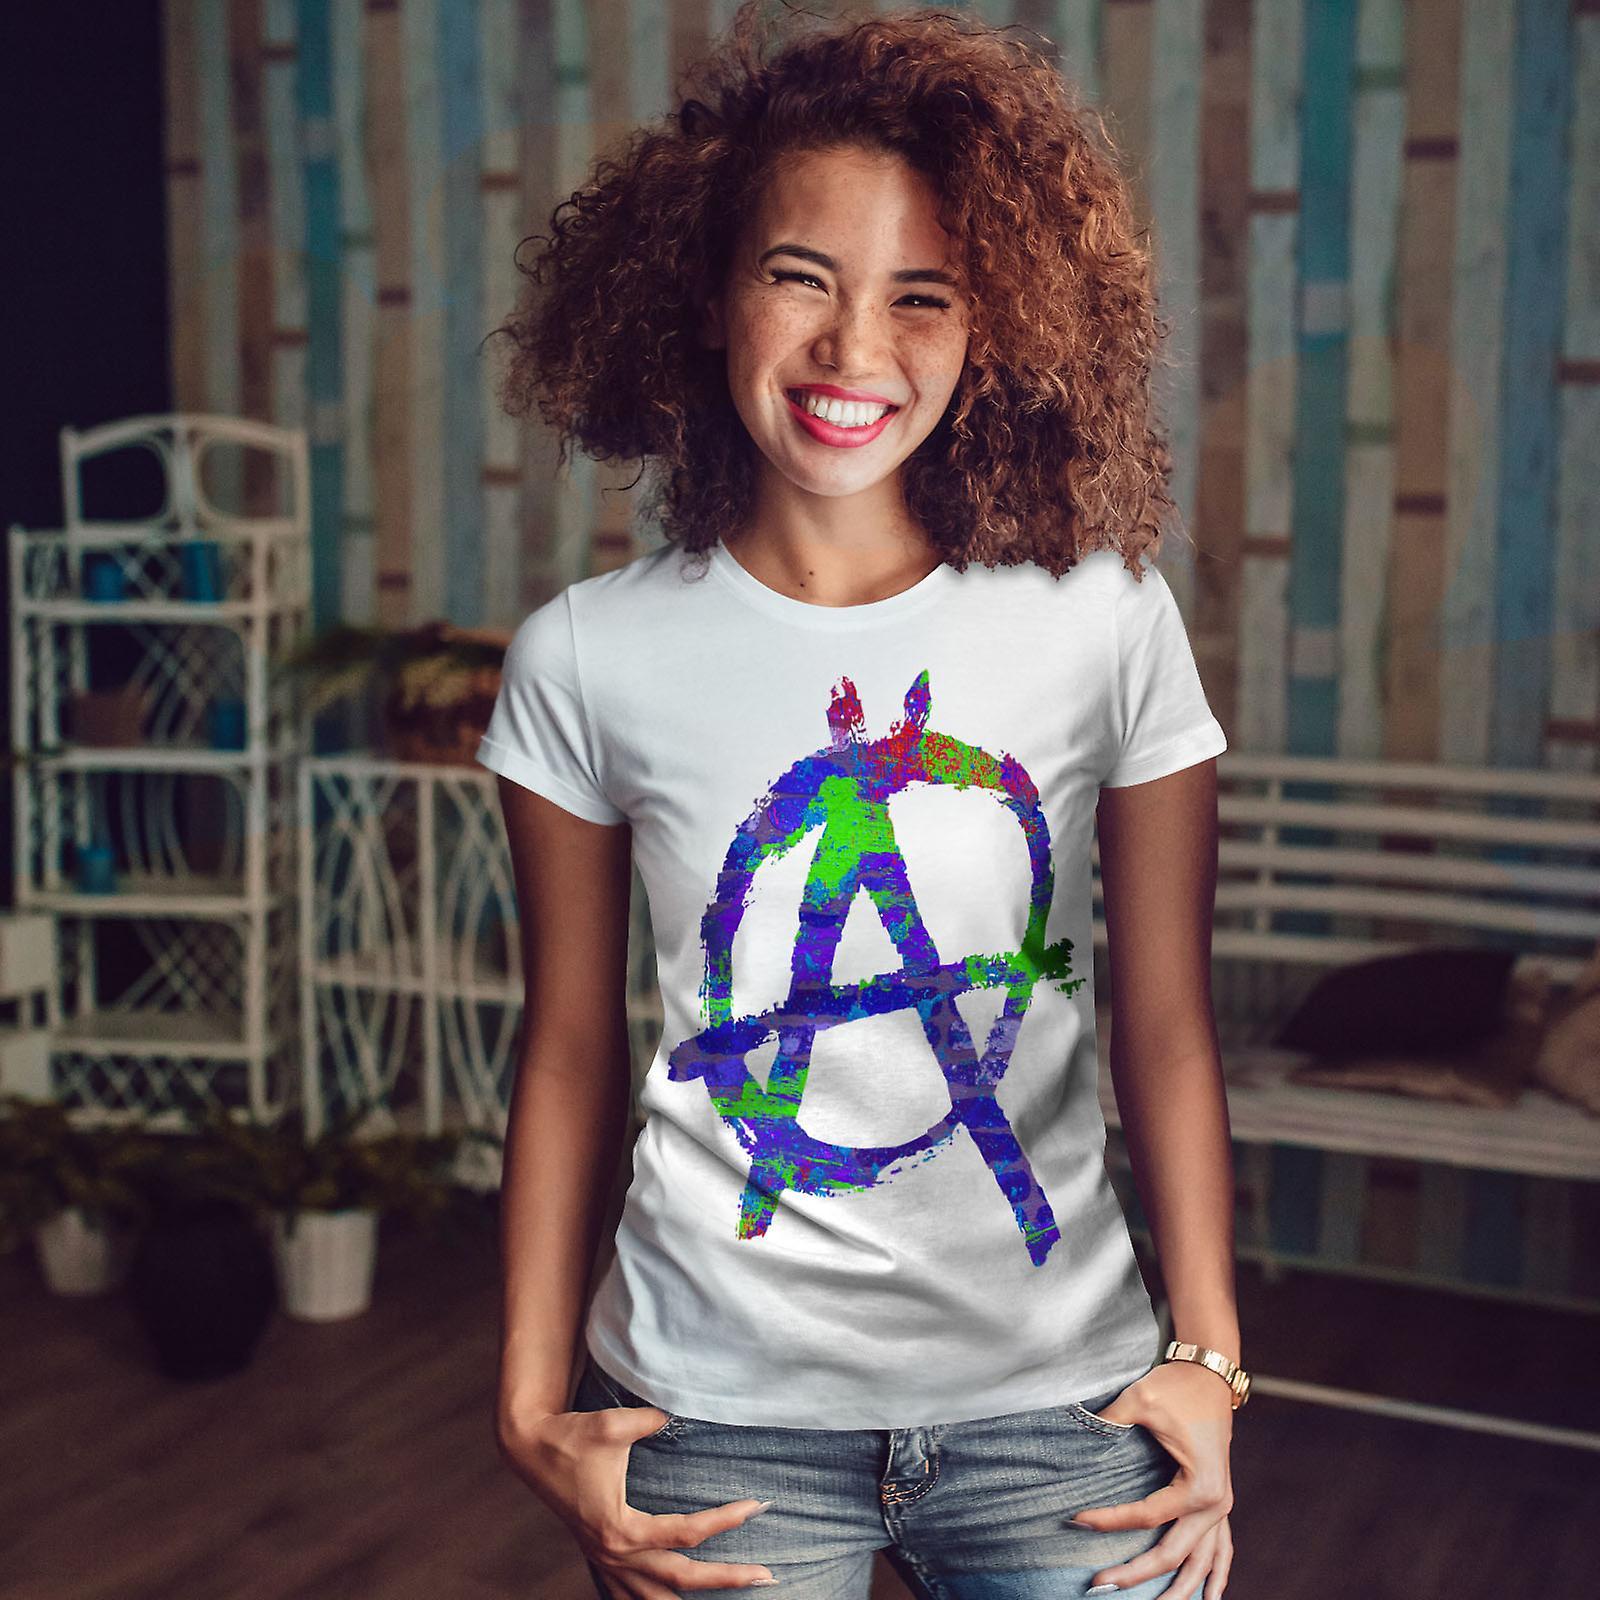 WhiteT-shirt anarchie symbole couleur femme | Wellcoda